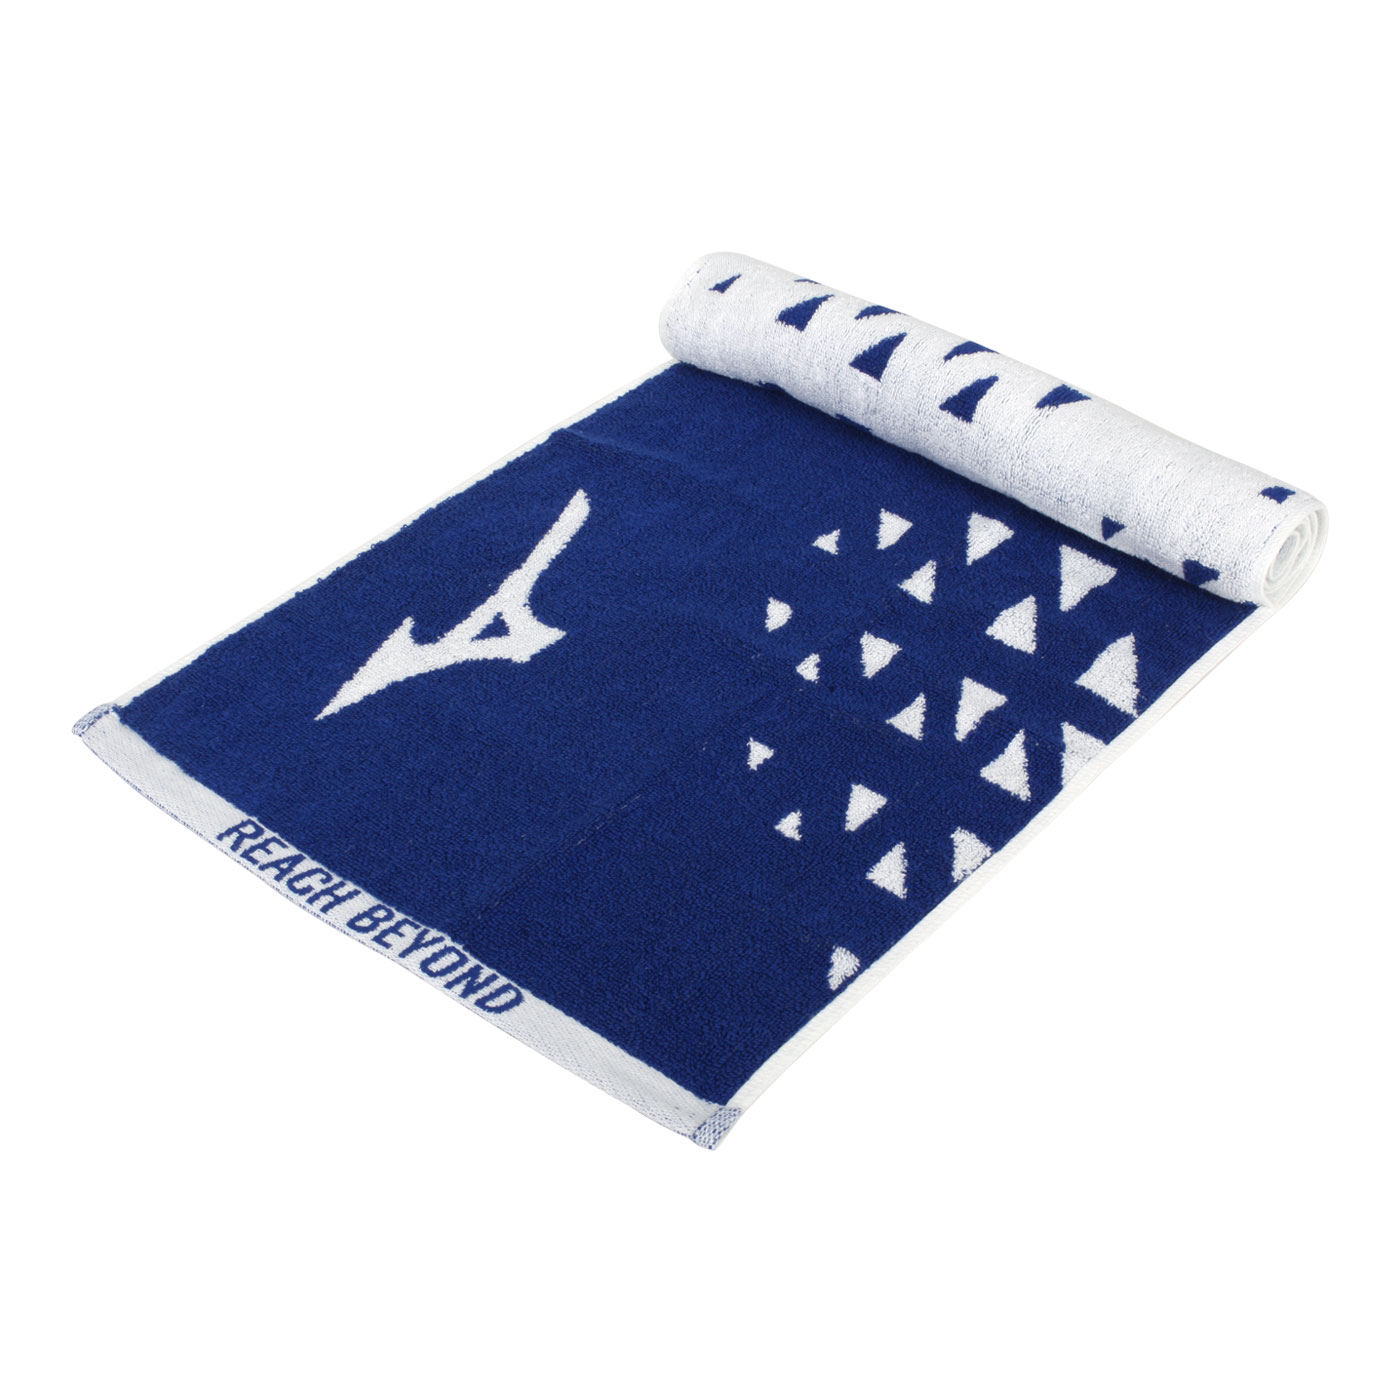 MIZUNO 運動毛巾 32TY110127 - 深藍白